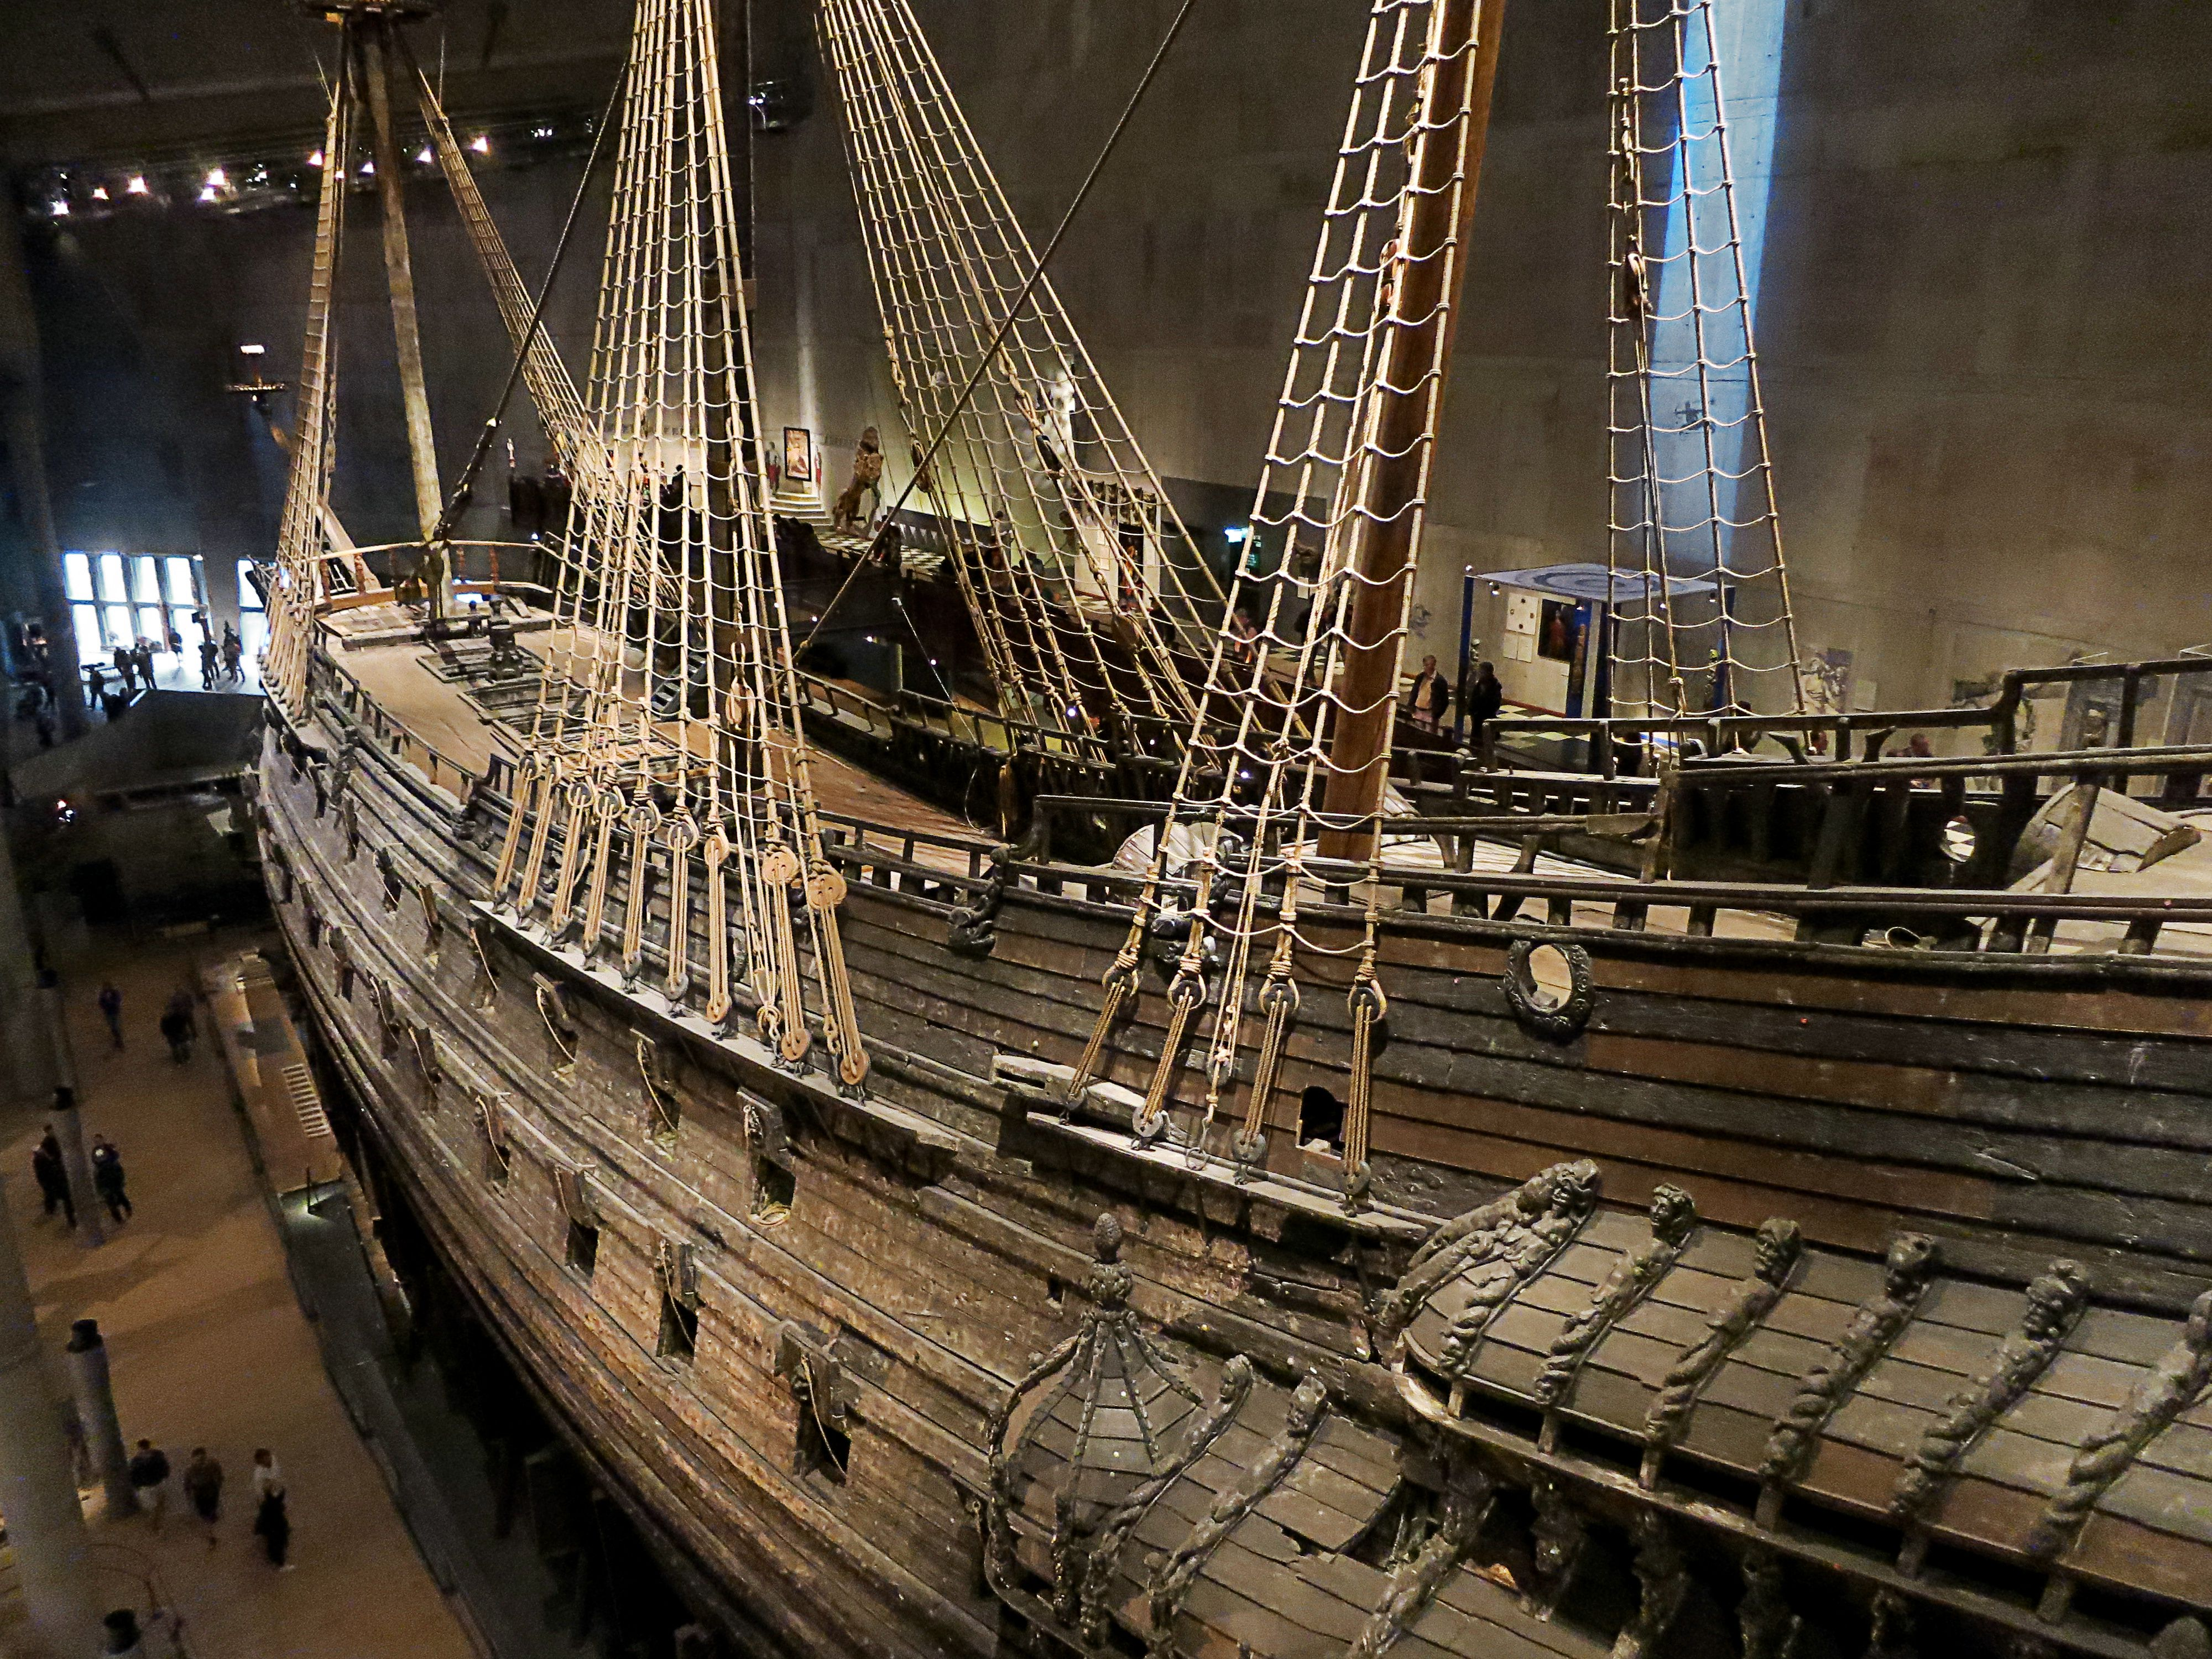 The vasa ship in stockholm sweden by savier stuff for Vasa ship